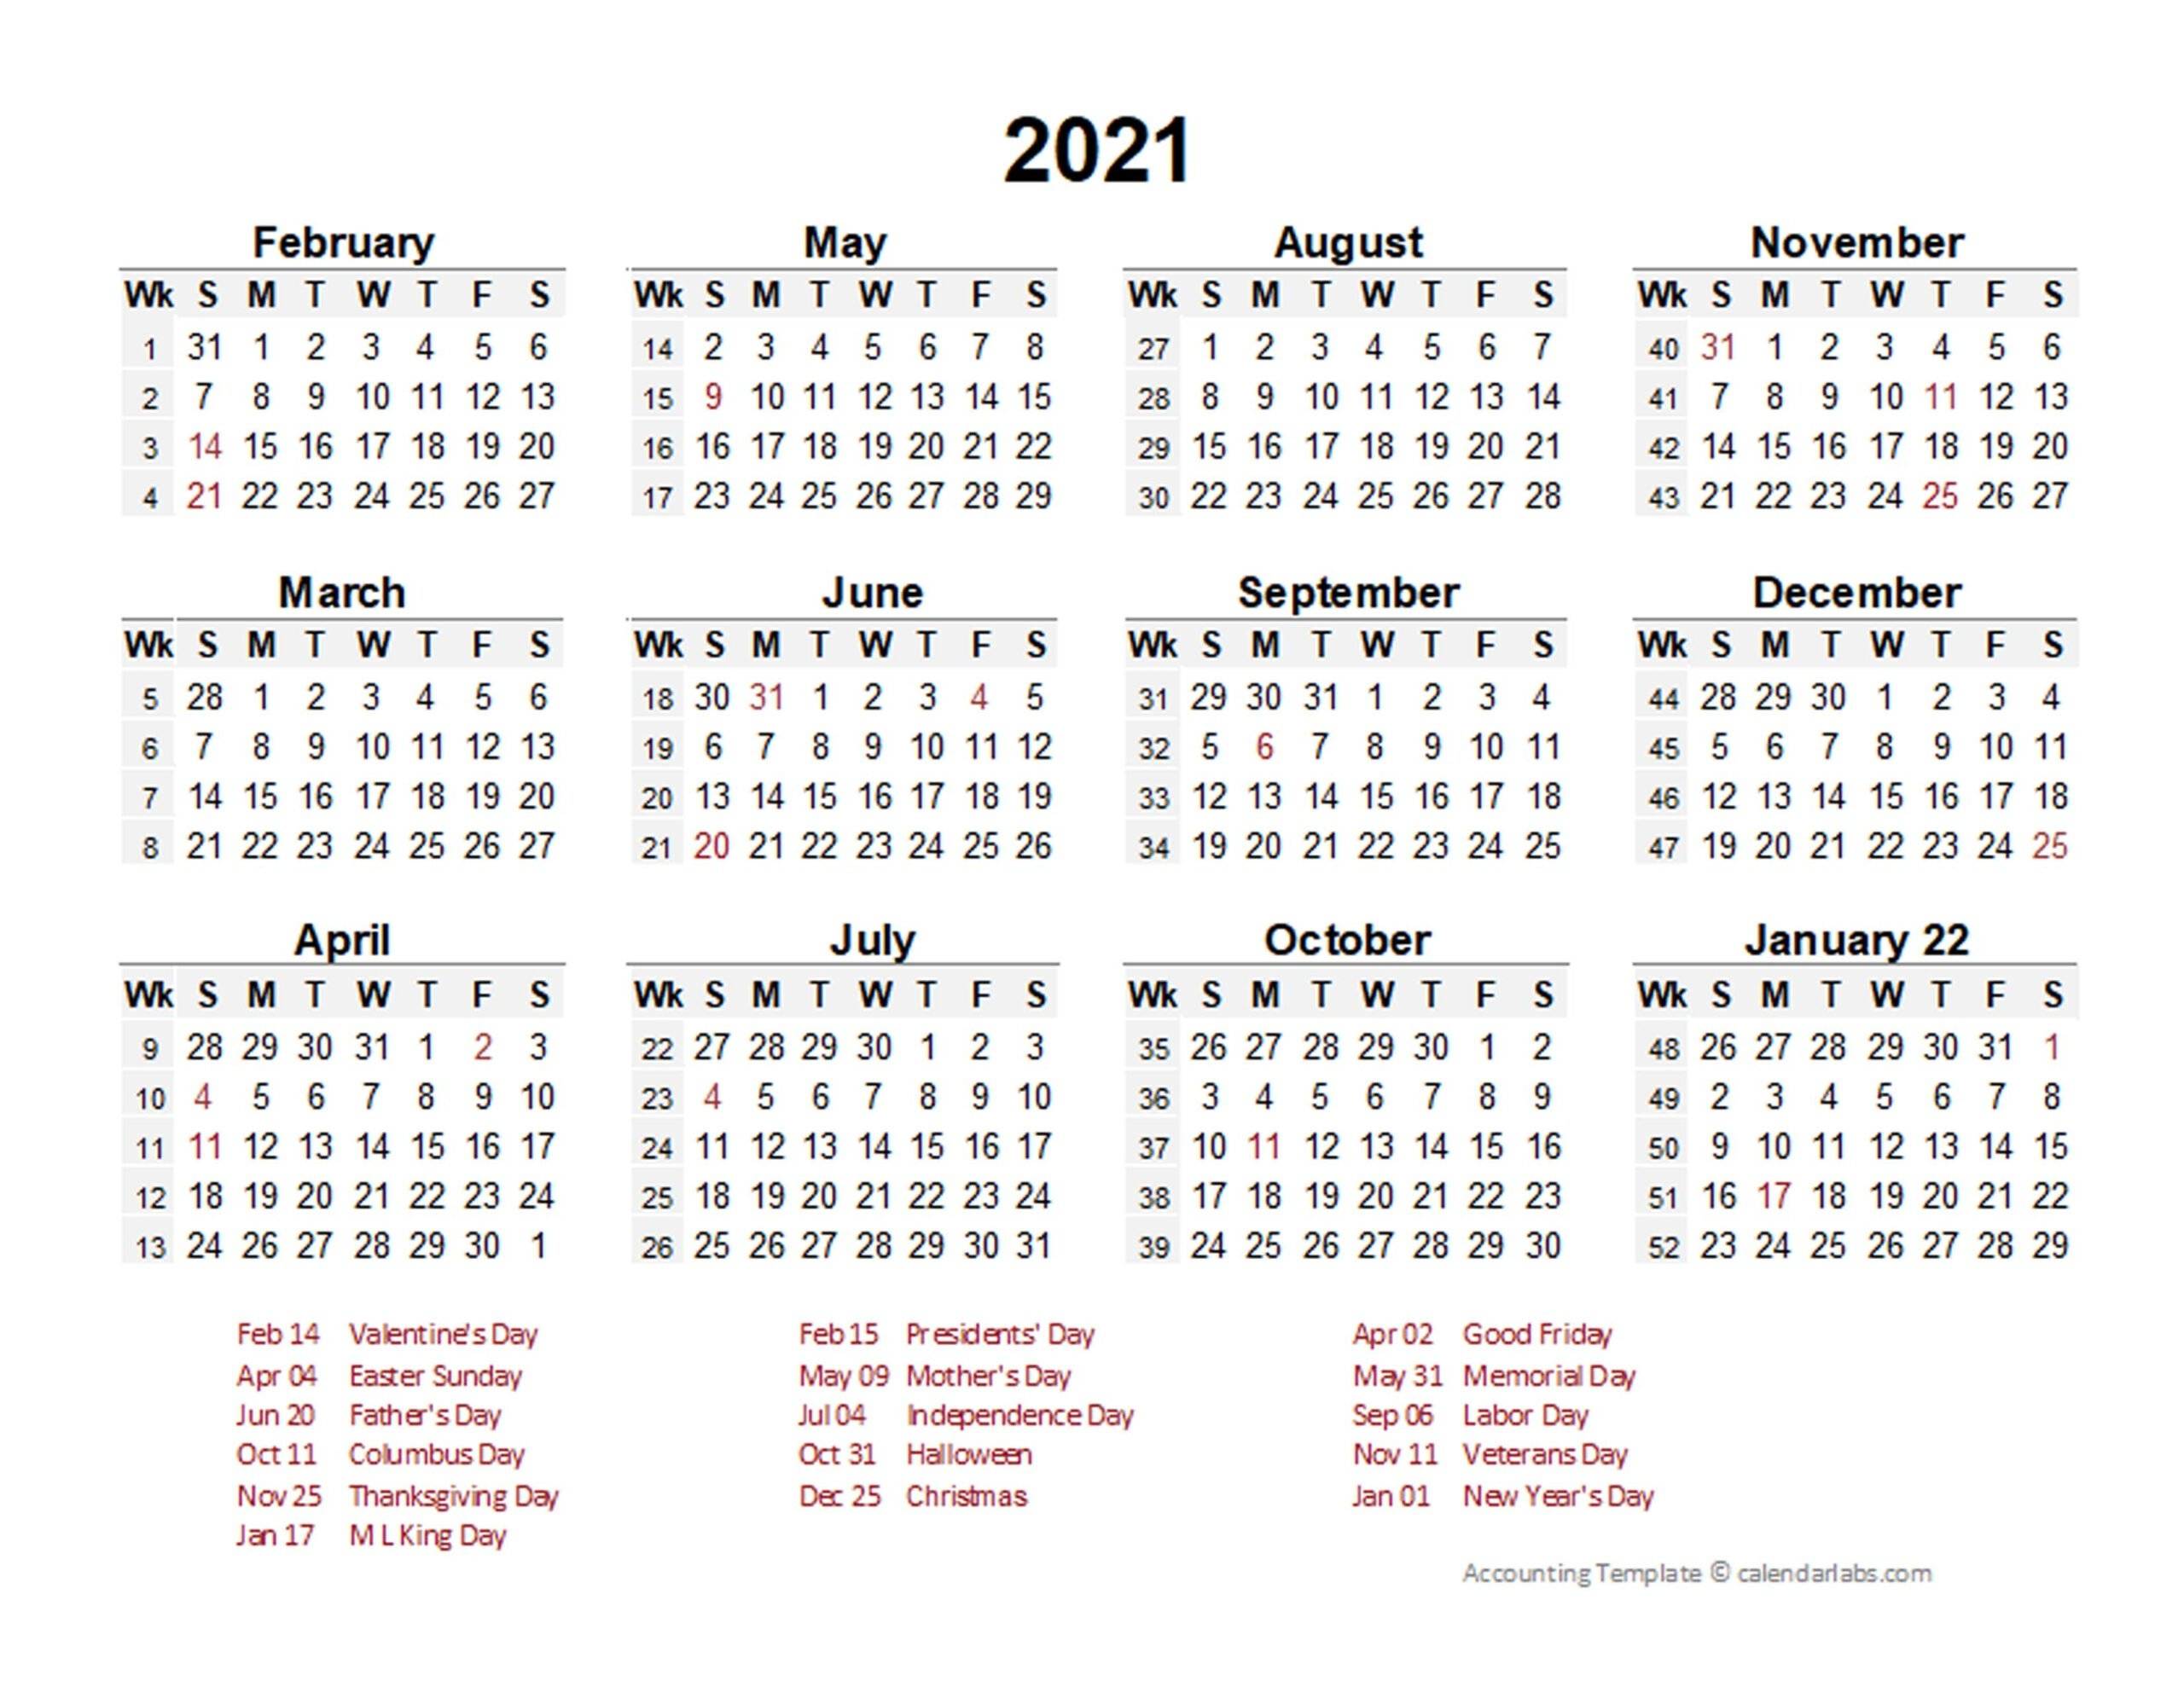 Printable Calendar 2021 With Lines | Printablecalendarsfor2021 with 2021 Calendar Hong Kong Template